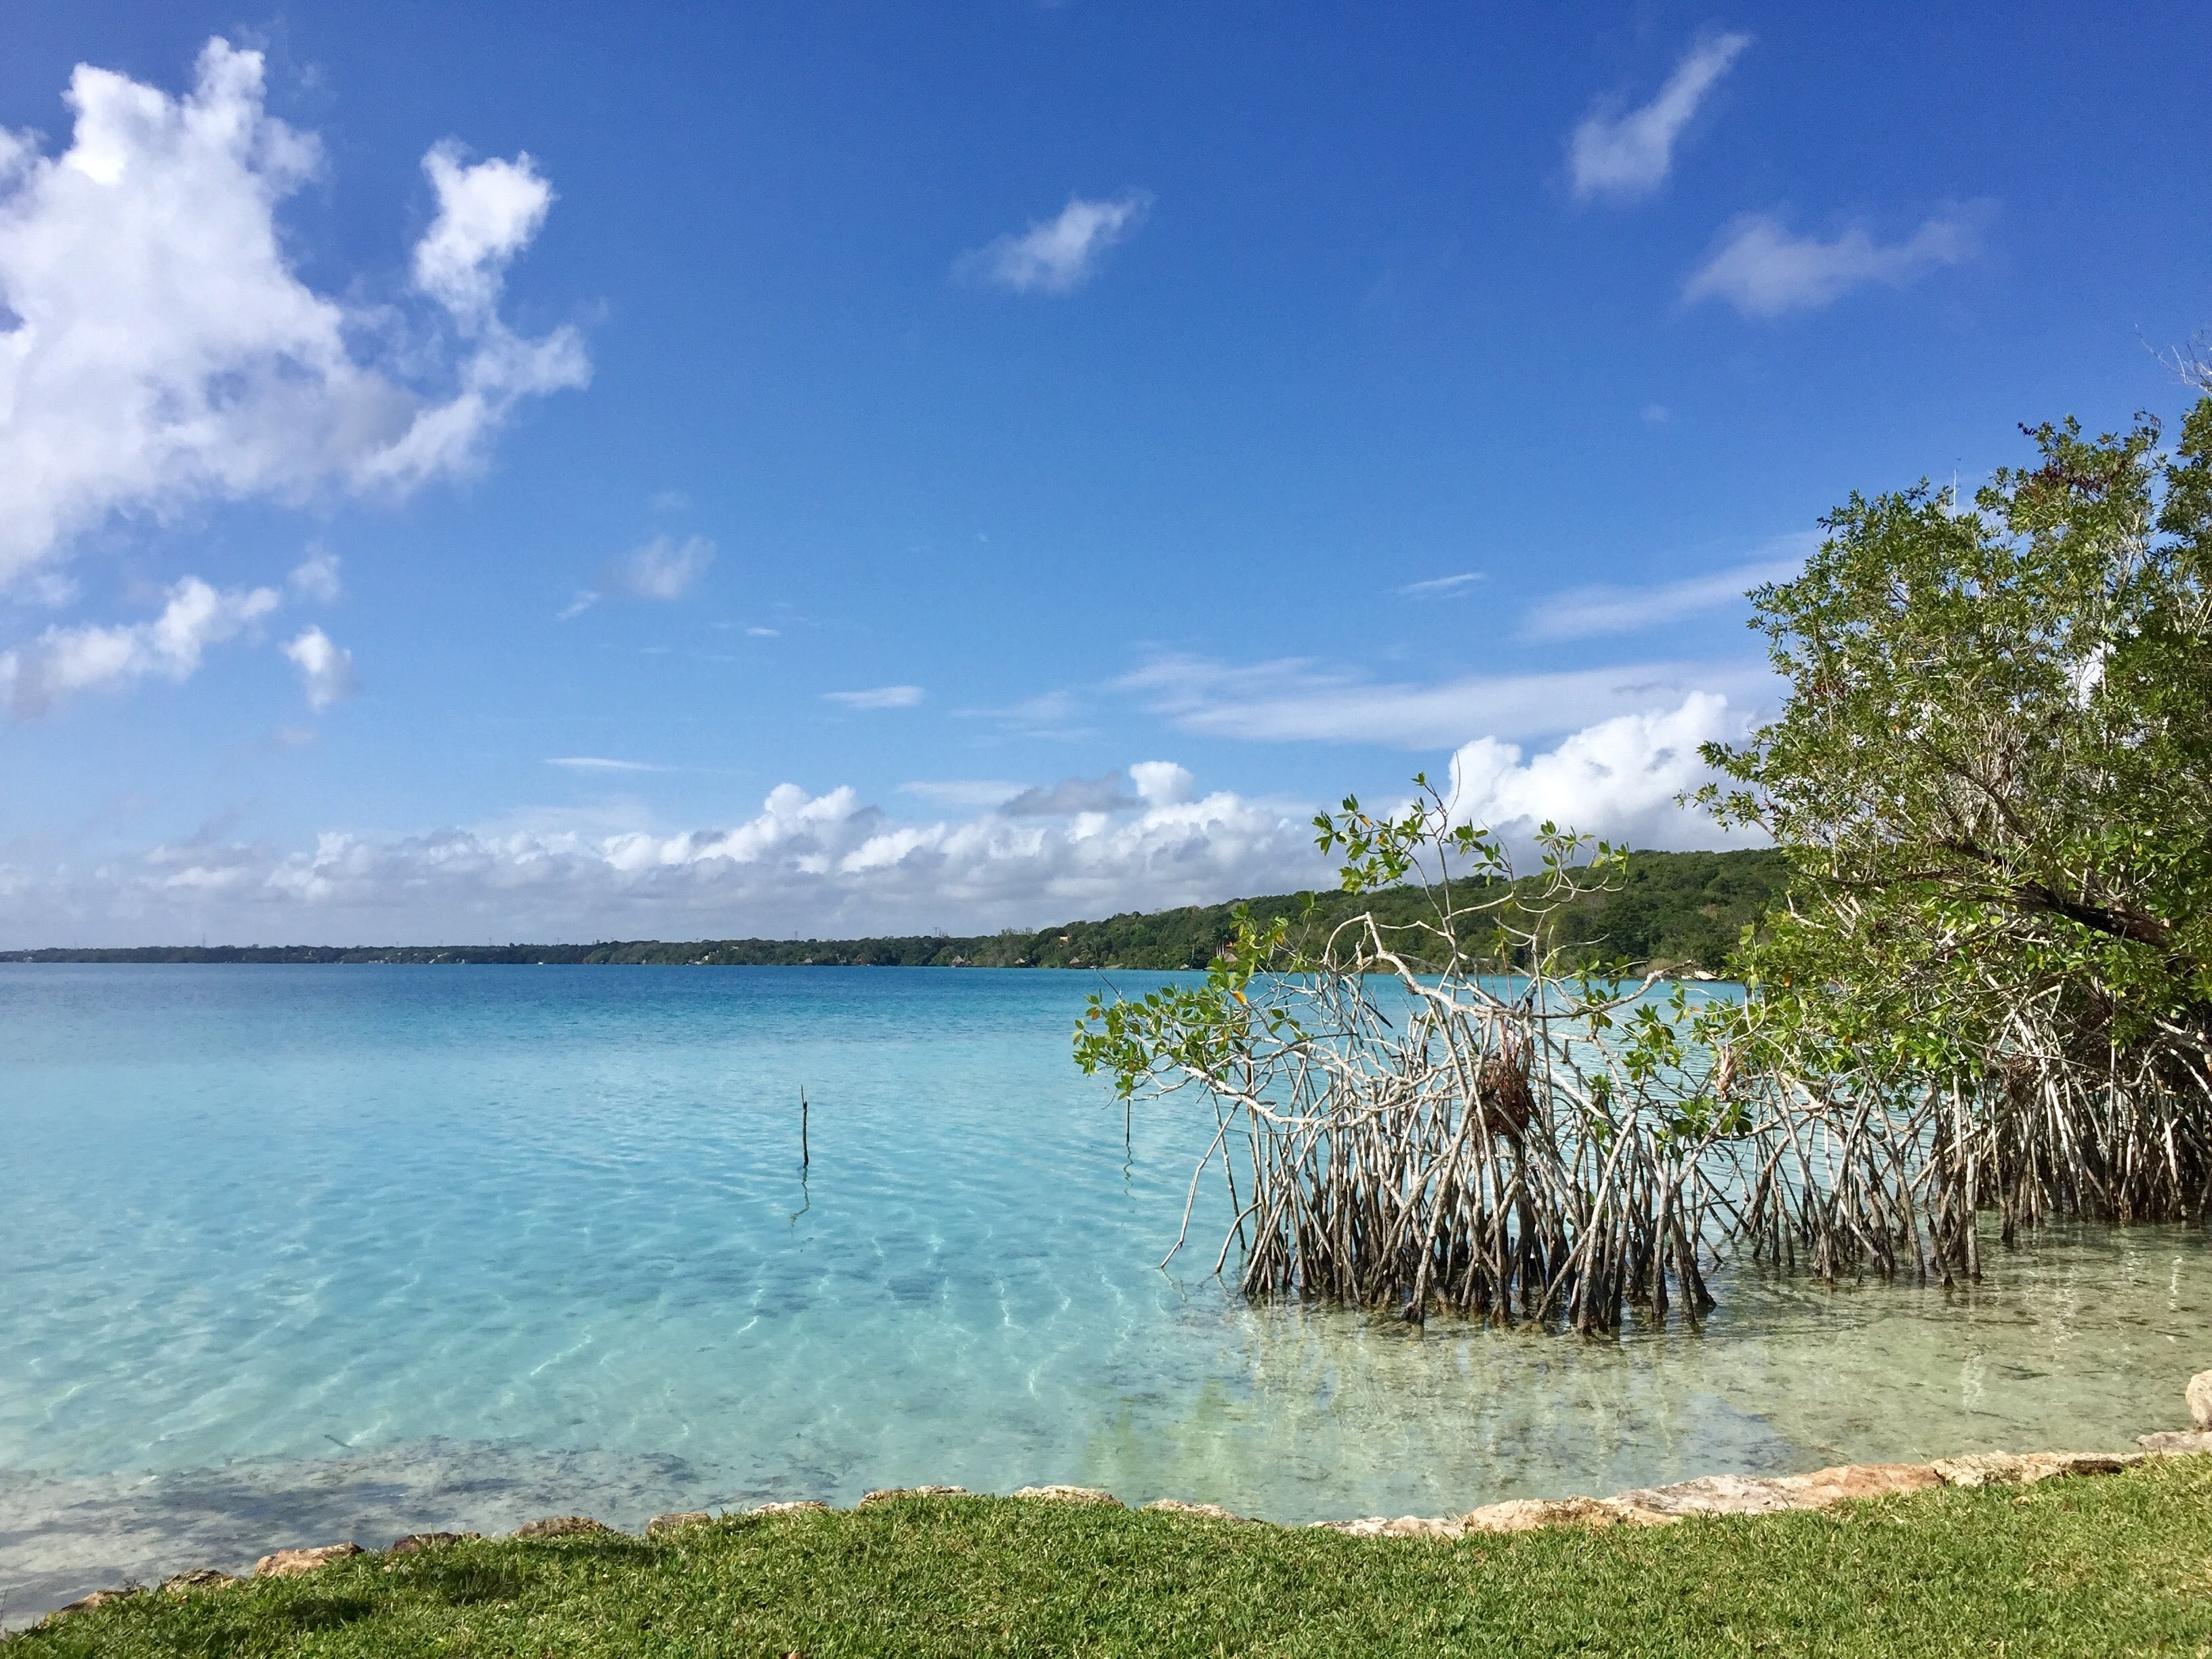 Shores of laguna bacalar